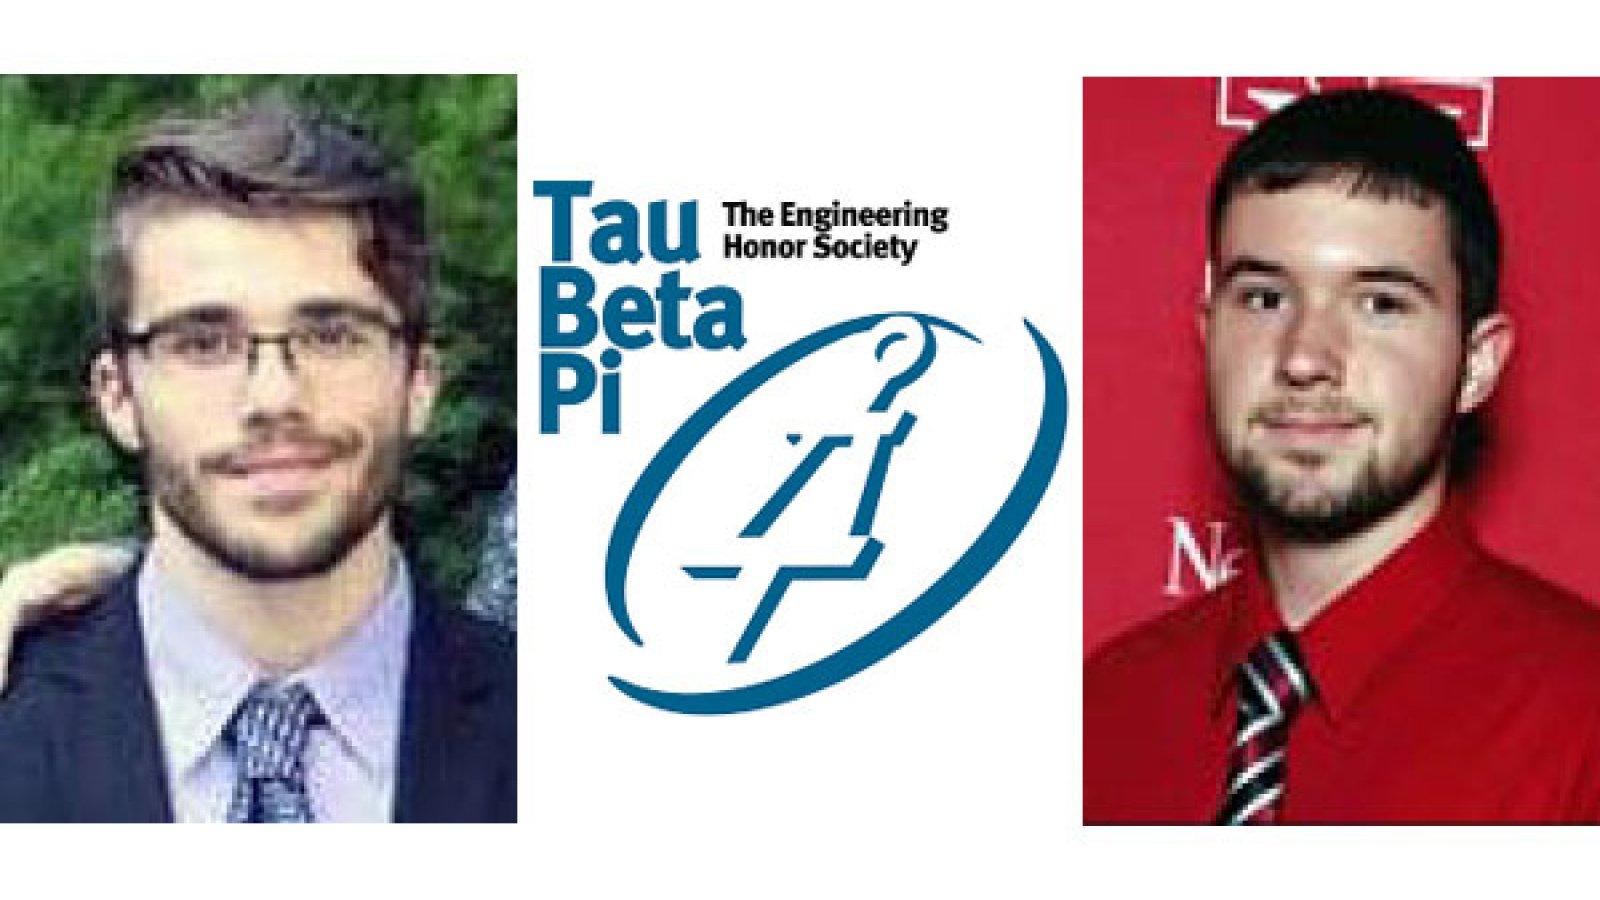 Nebraska Engineering students Zvonimir Pusnik (left) and Nicholas Seier were chosen as 2018-19 Tau Beta Pi Scholars.